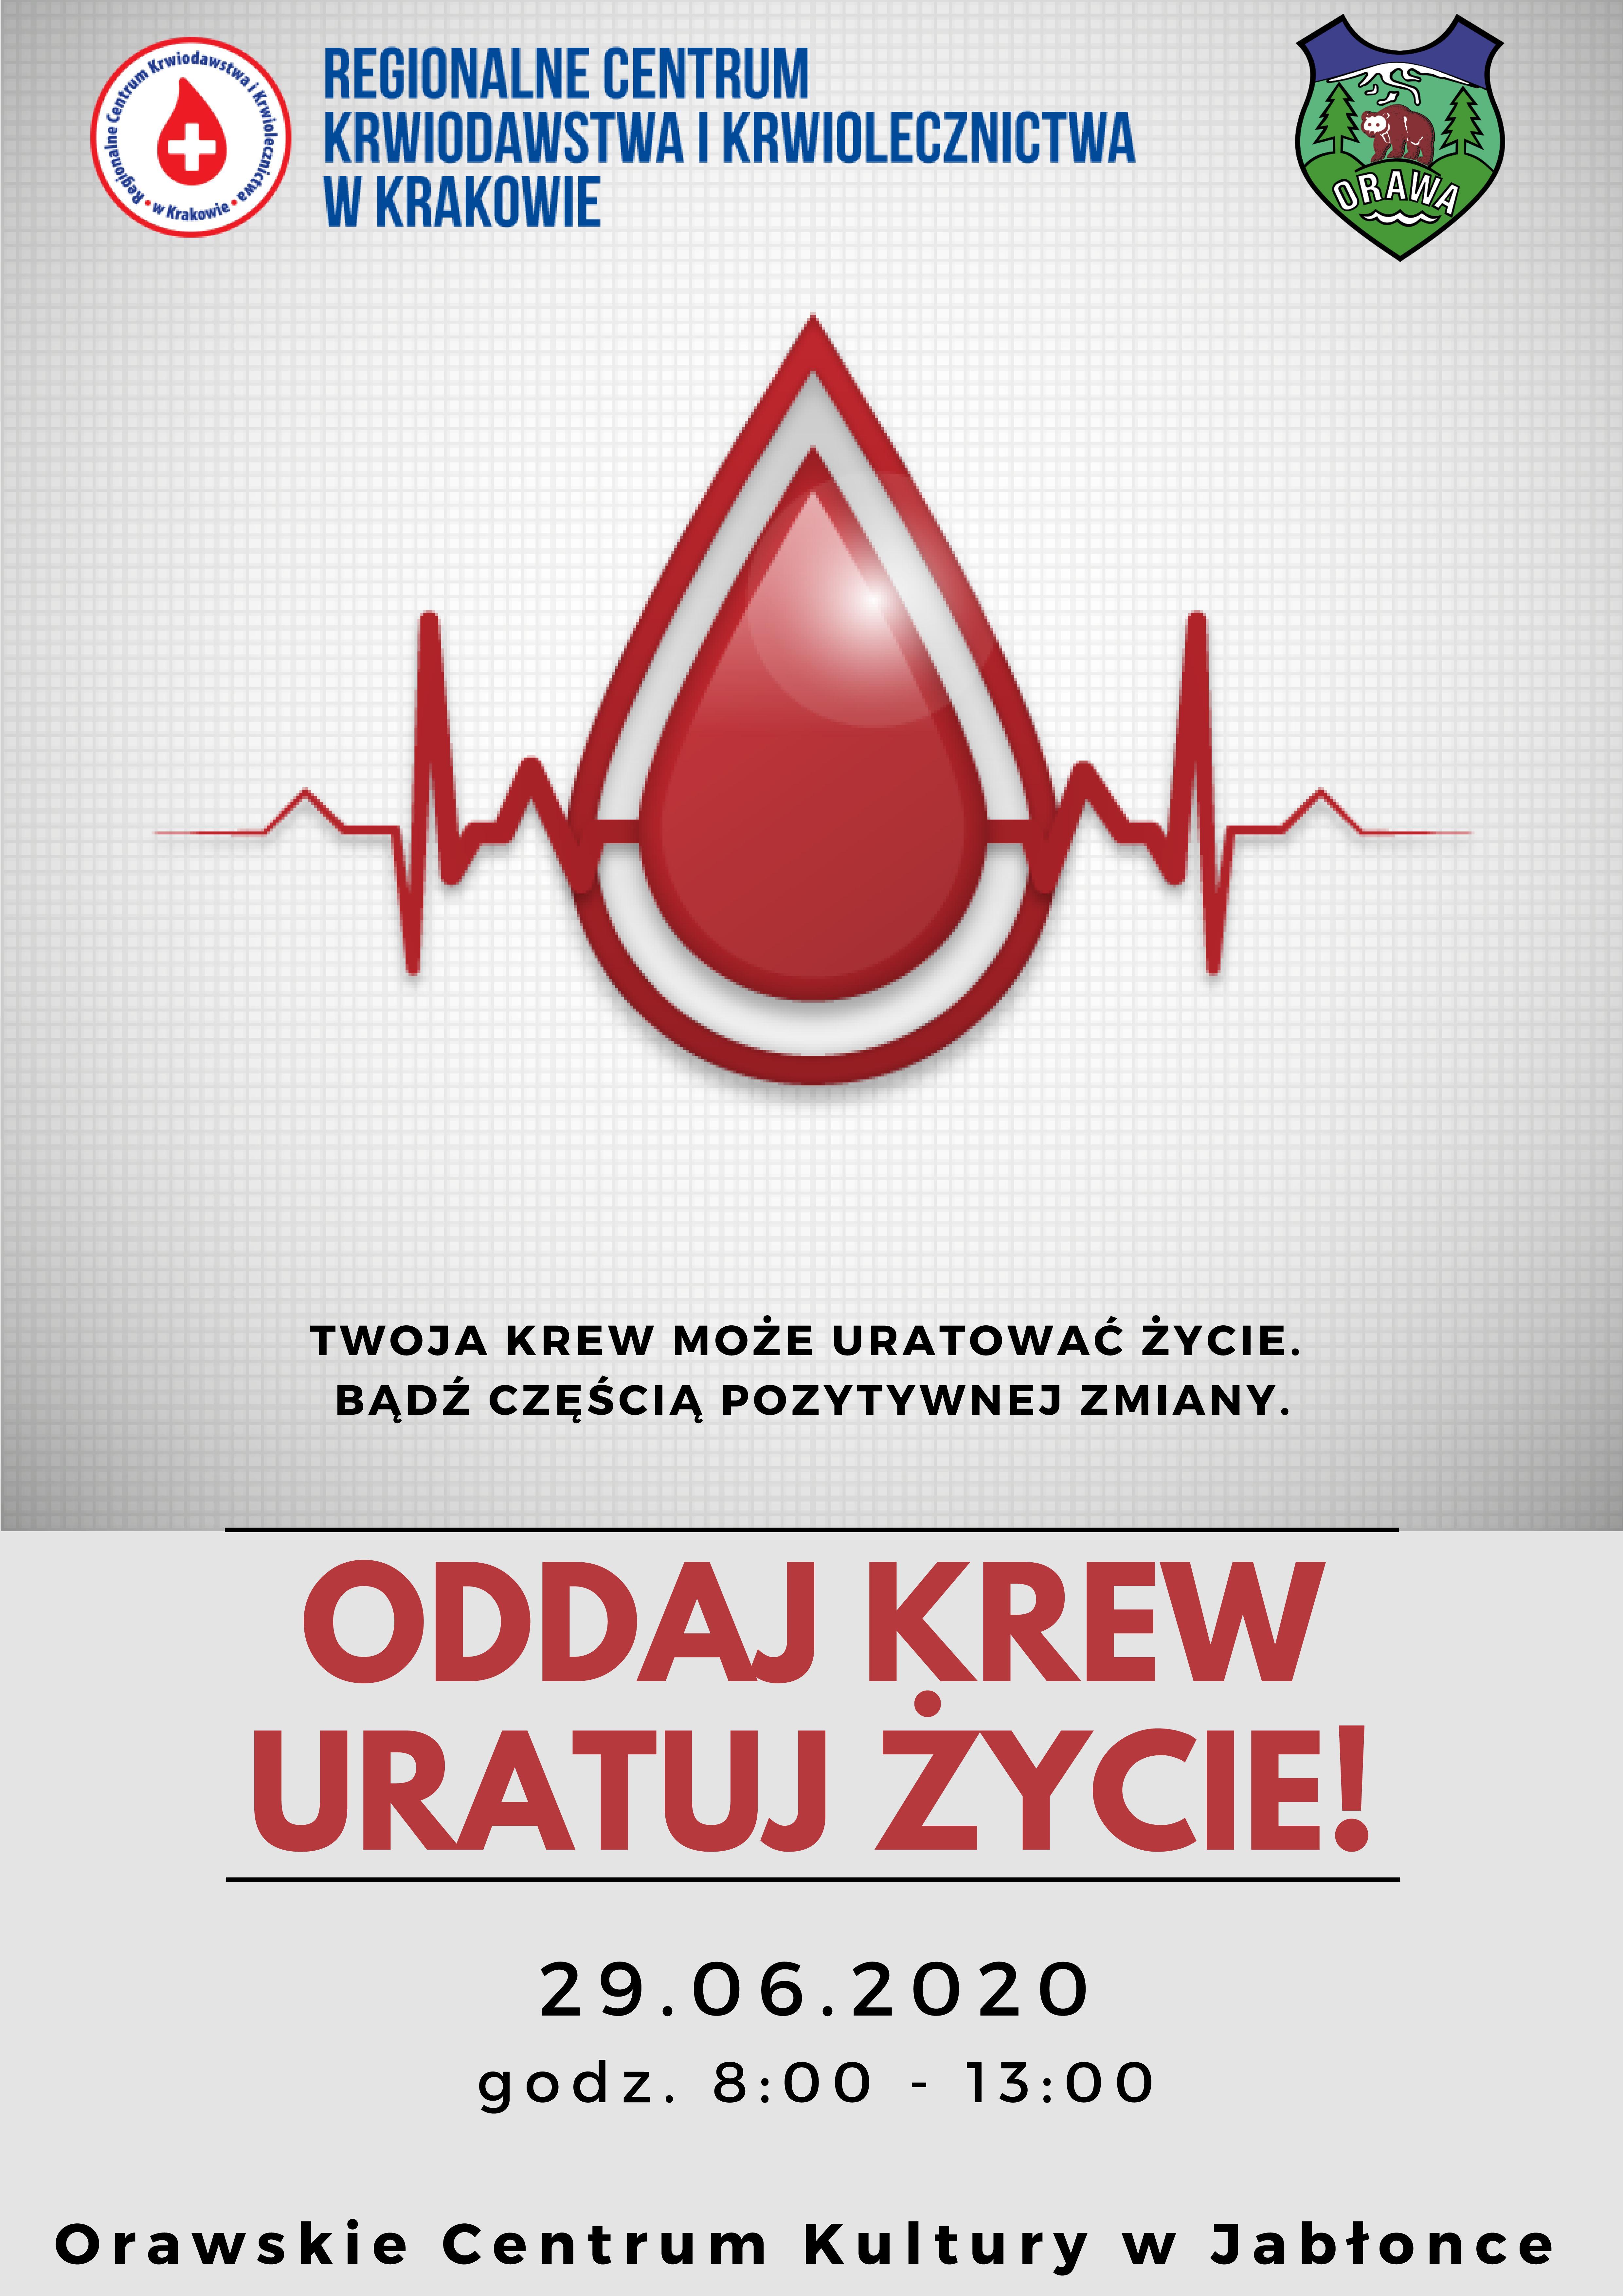 https://www.jablonka.pl/images/Plakat_Krwiodastwo.jpg